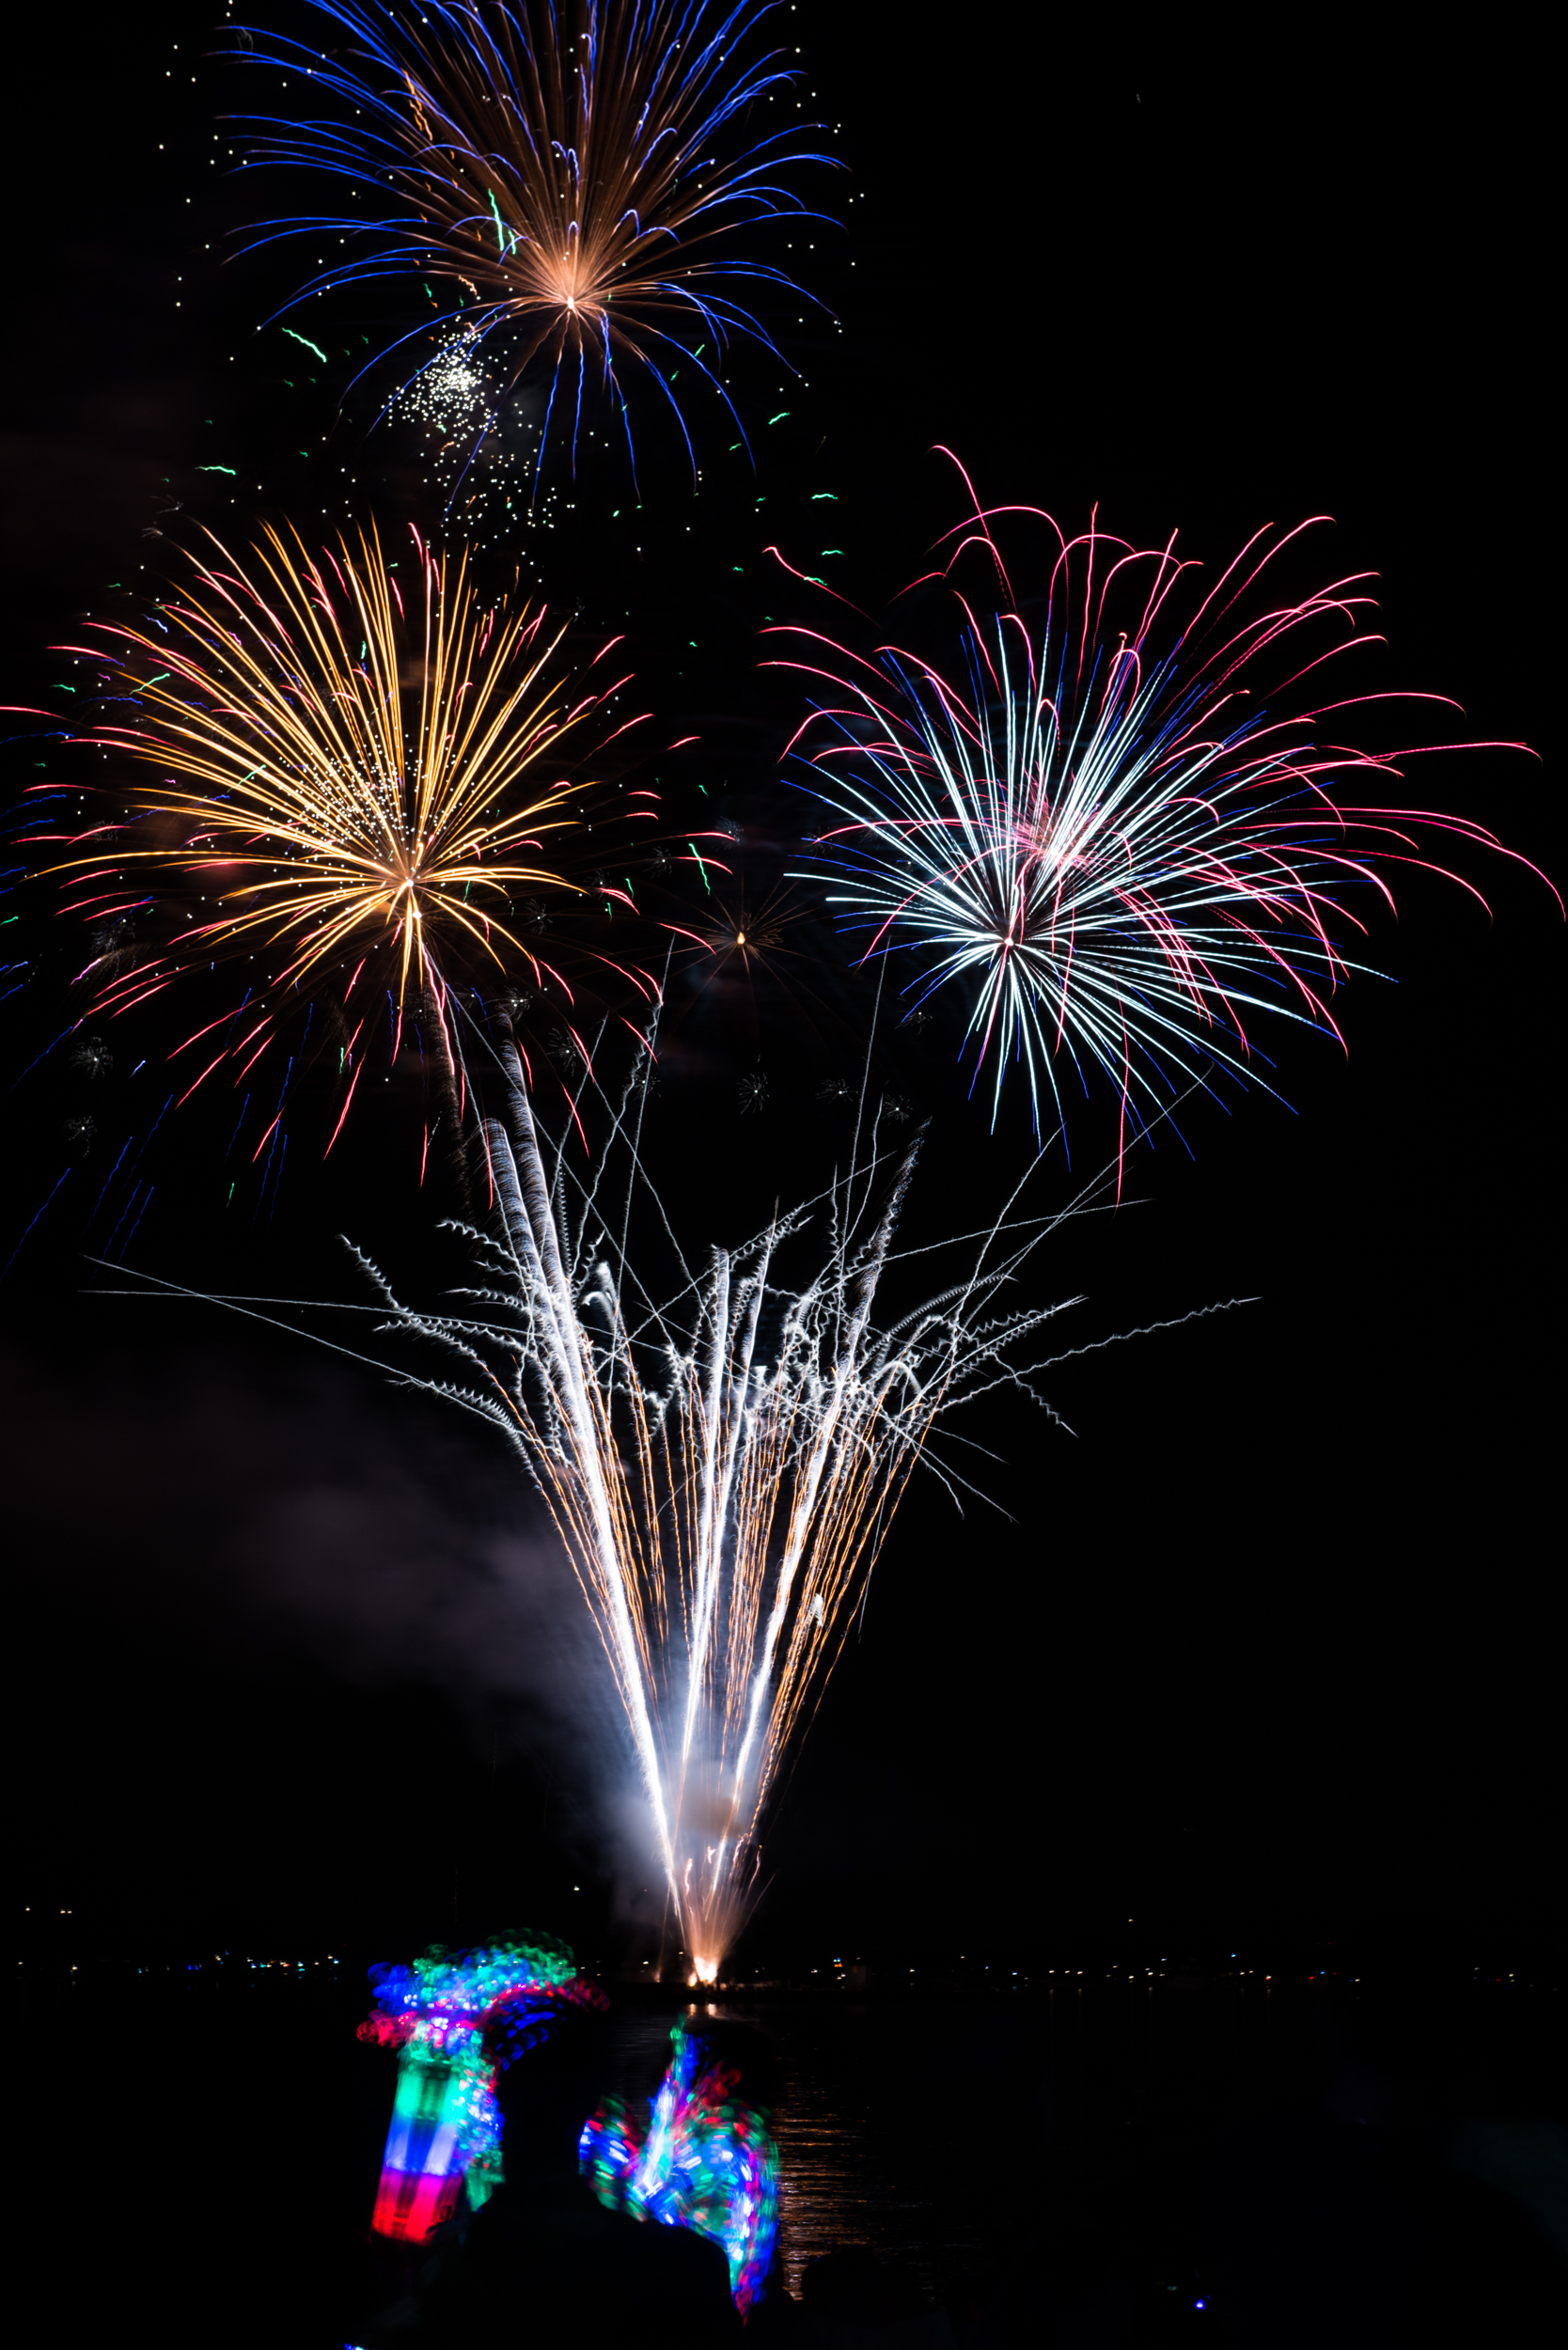 Fireworks-2015-12.jpg